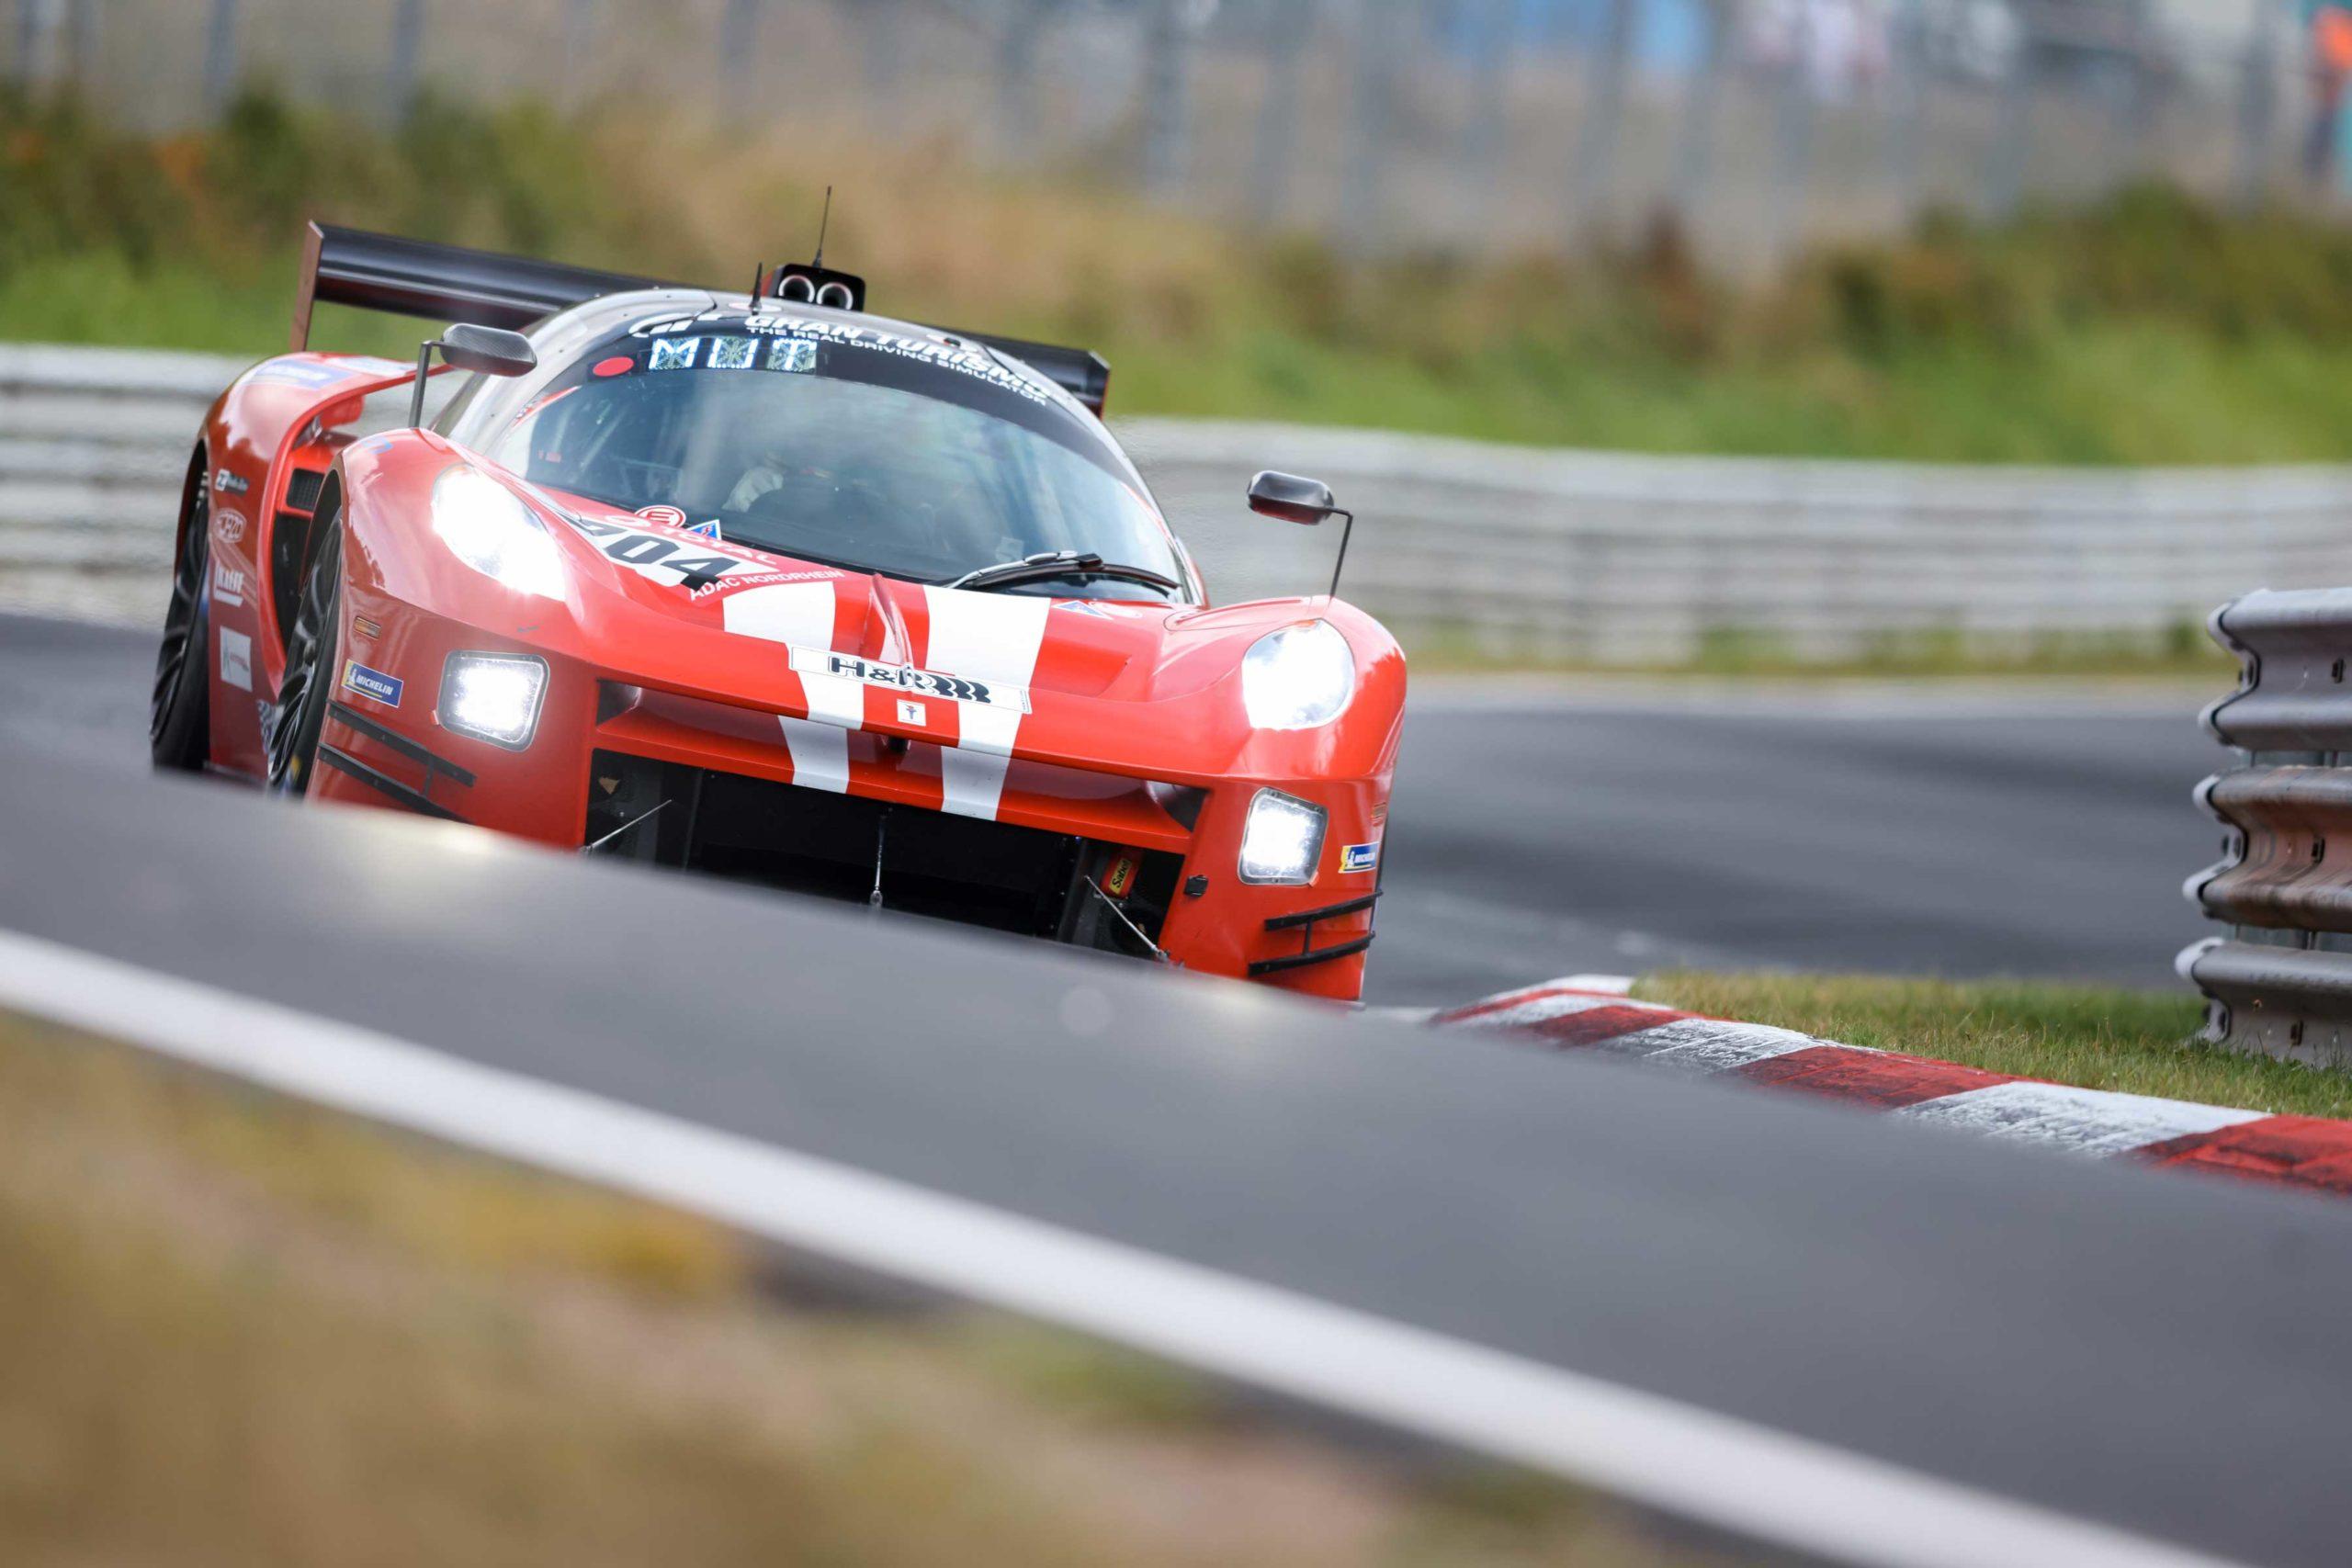 24h-Rennen-2020_Scuderia-Cameron-Glickenhaus_SCG004C_Foto-GruppeC_ADAC